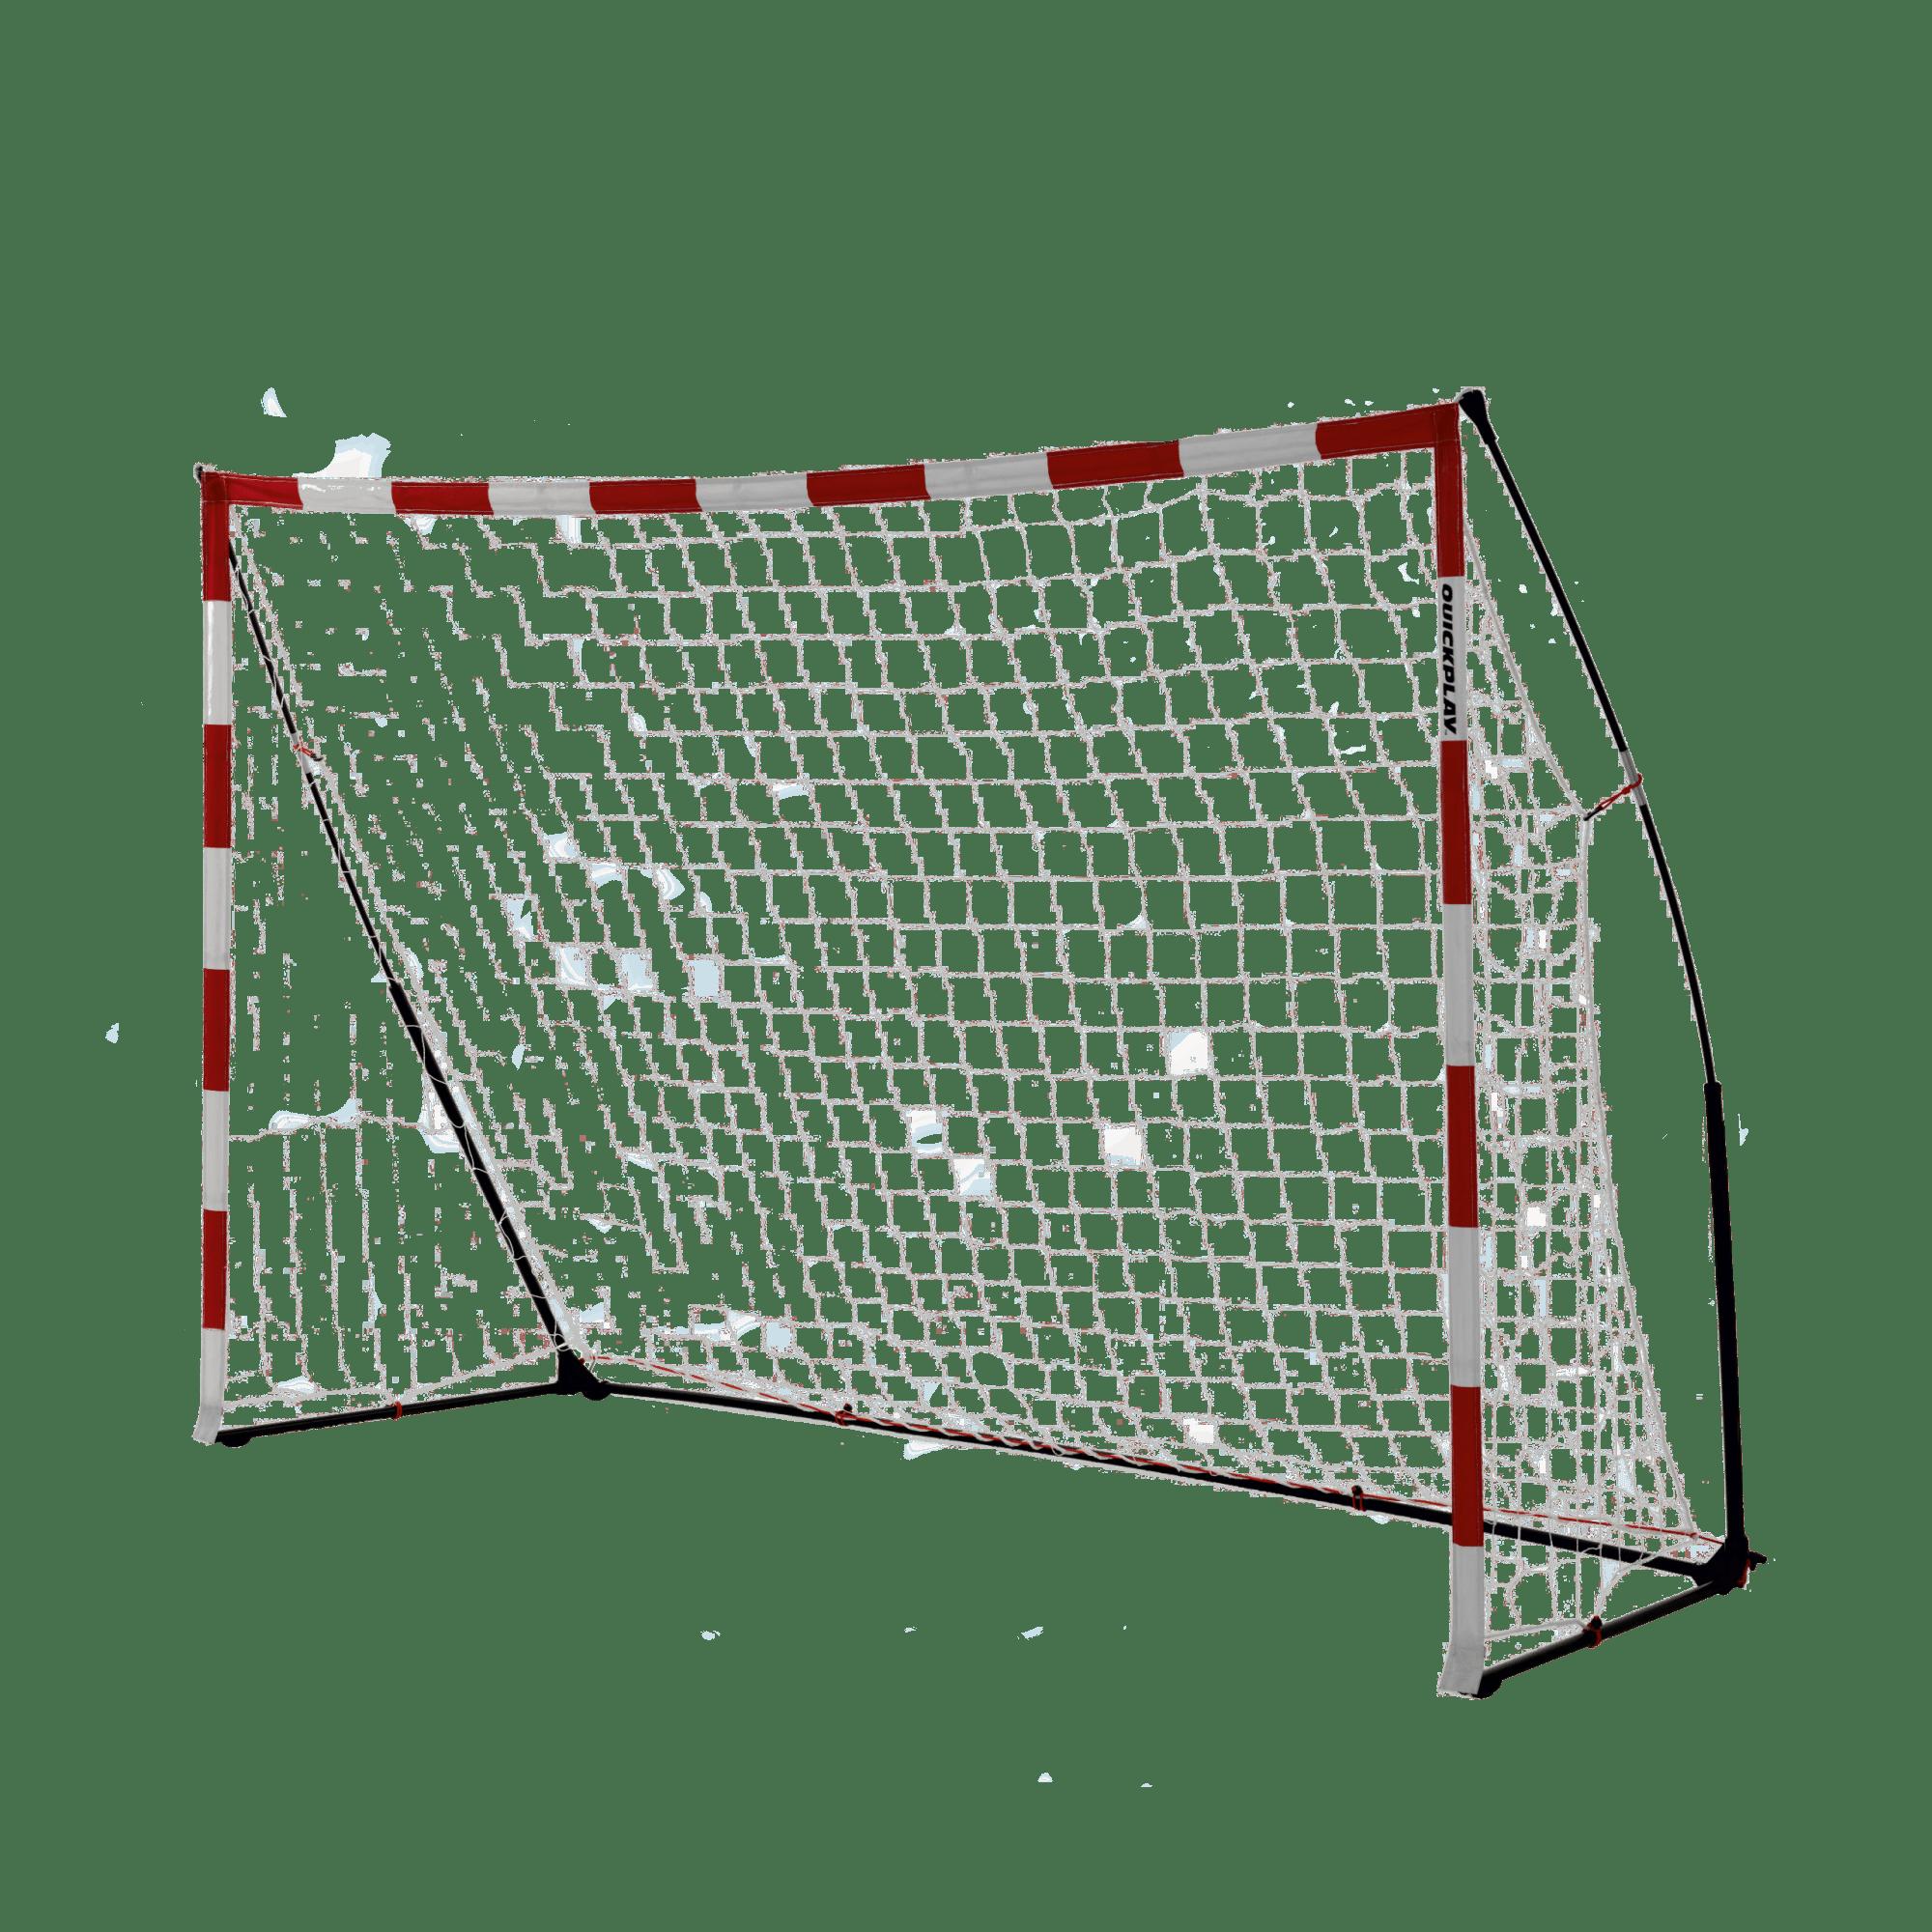 H 200 x D 65 x B 300 cm - Perfekt til både træning eller sjov haveleg